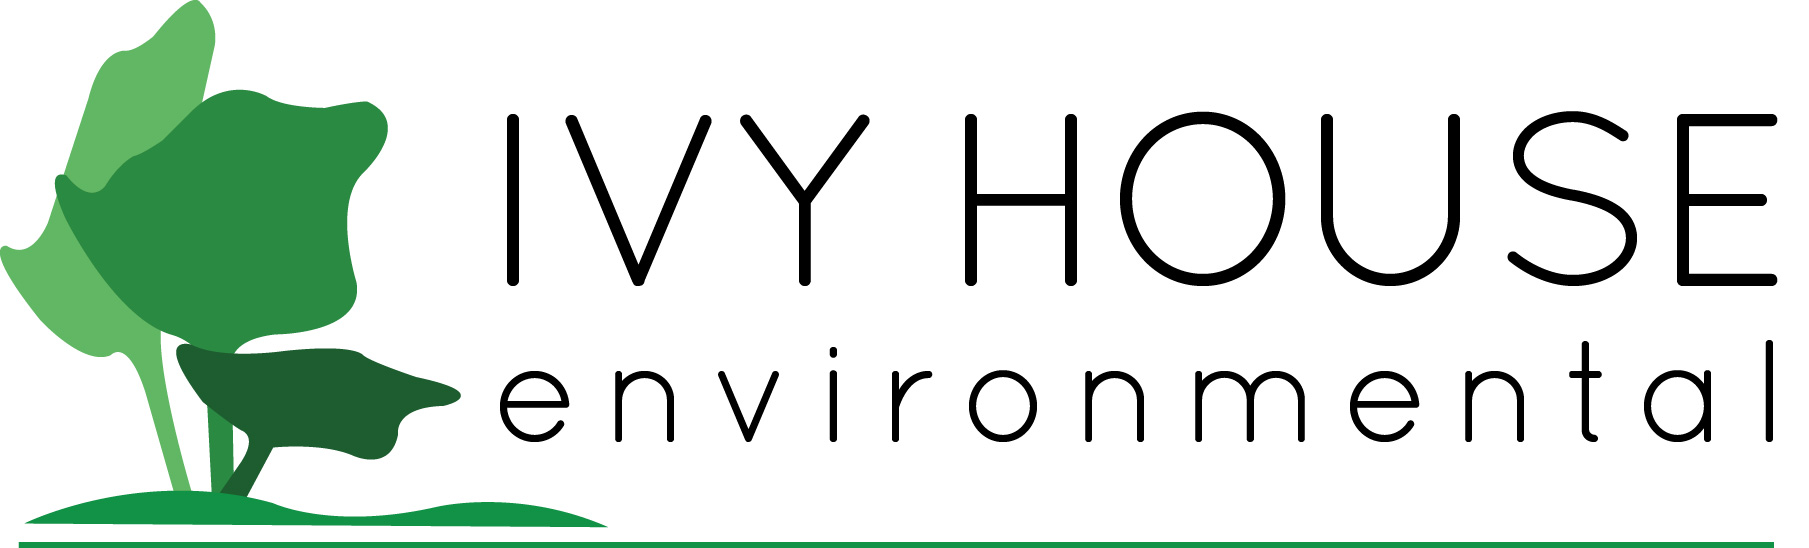 ivyhouse_logo_thicker.jpg